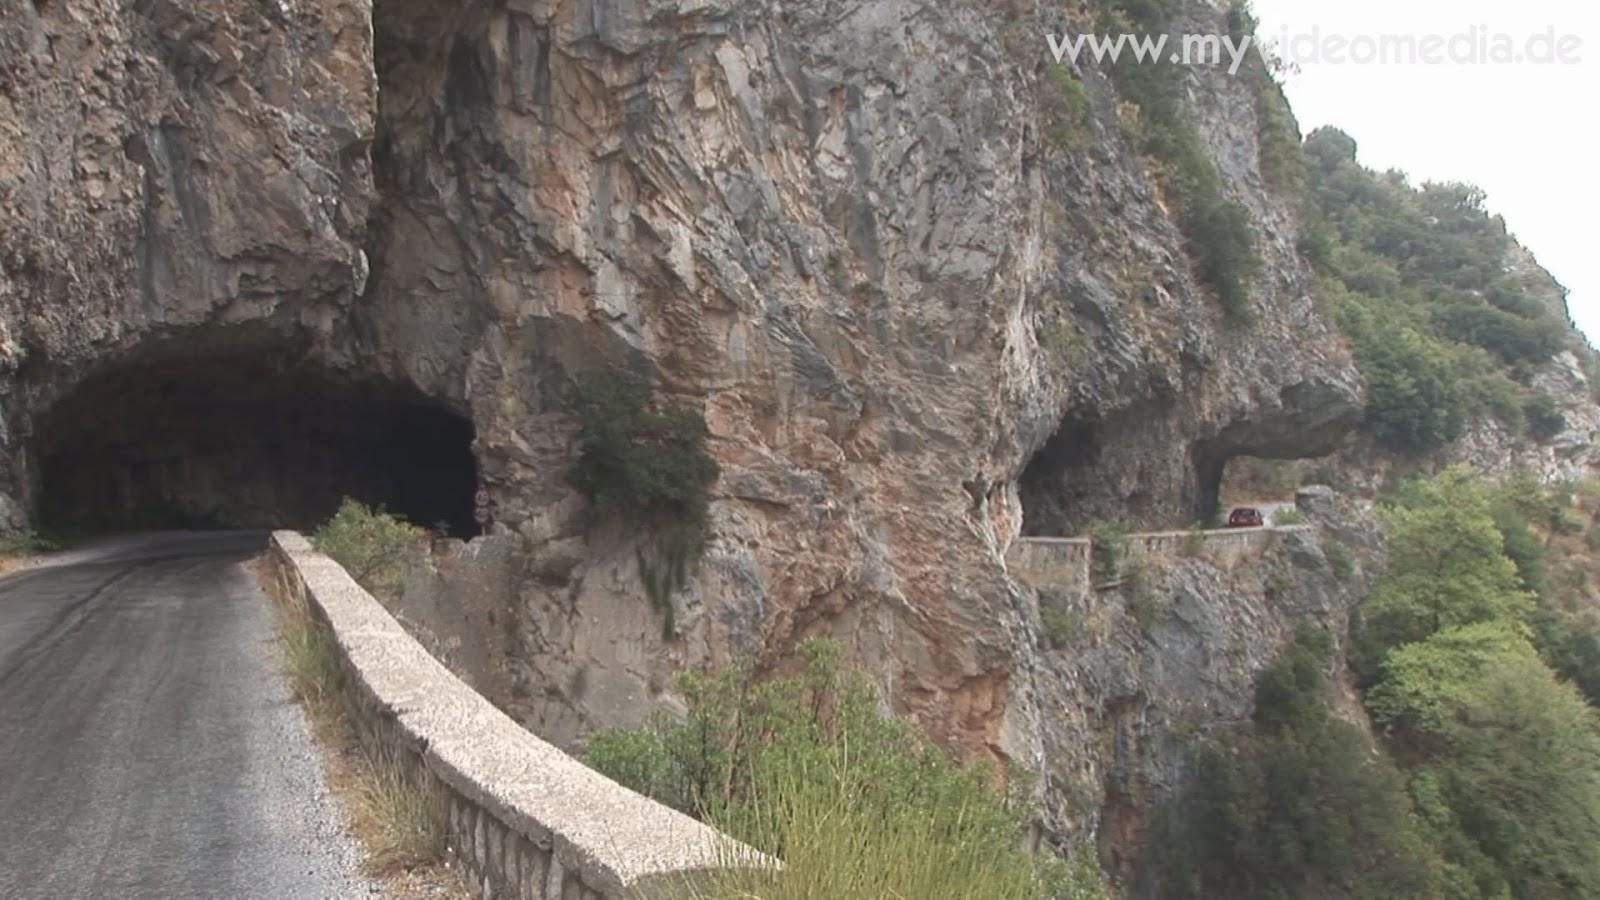 winding road from Kalamata to Mystras